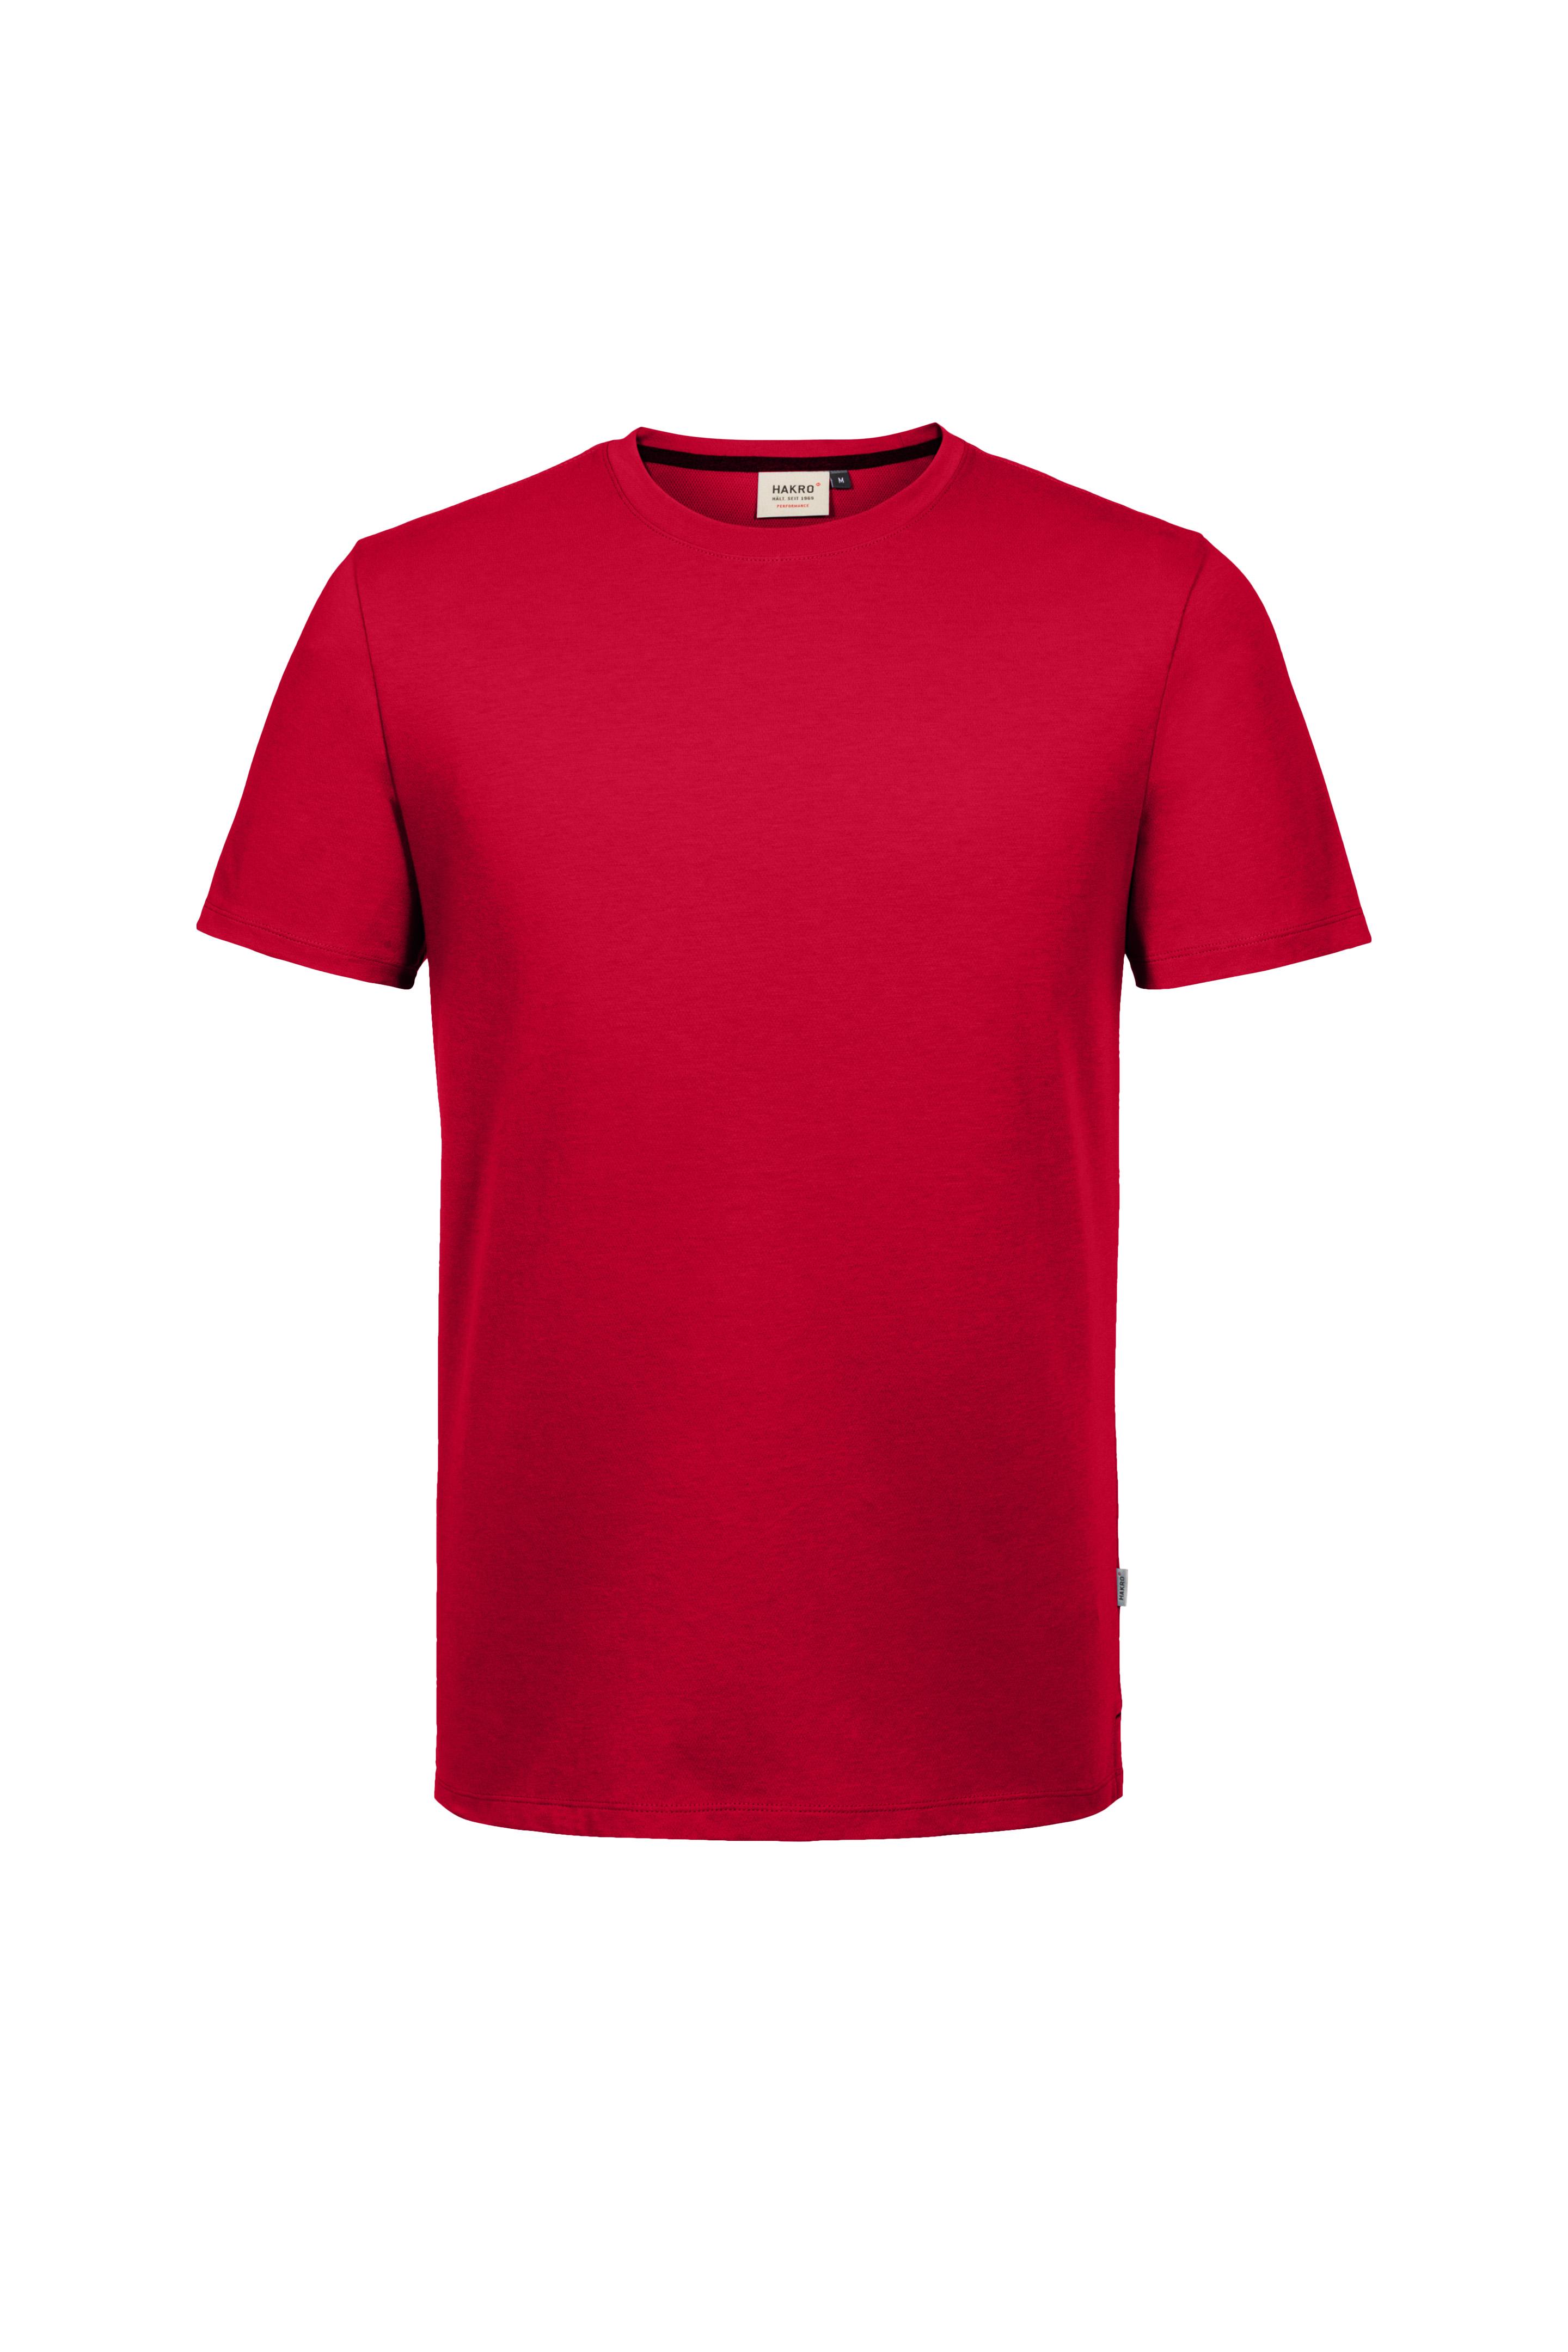 T-Shirt Cotton-Tec 269